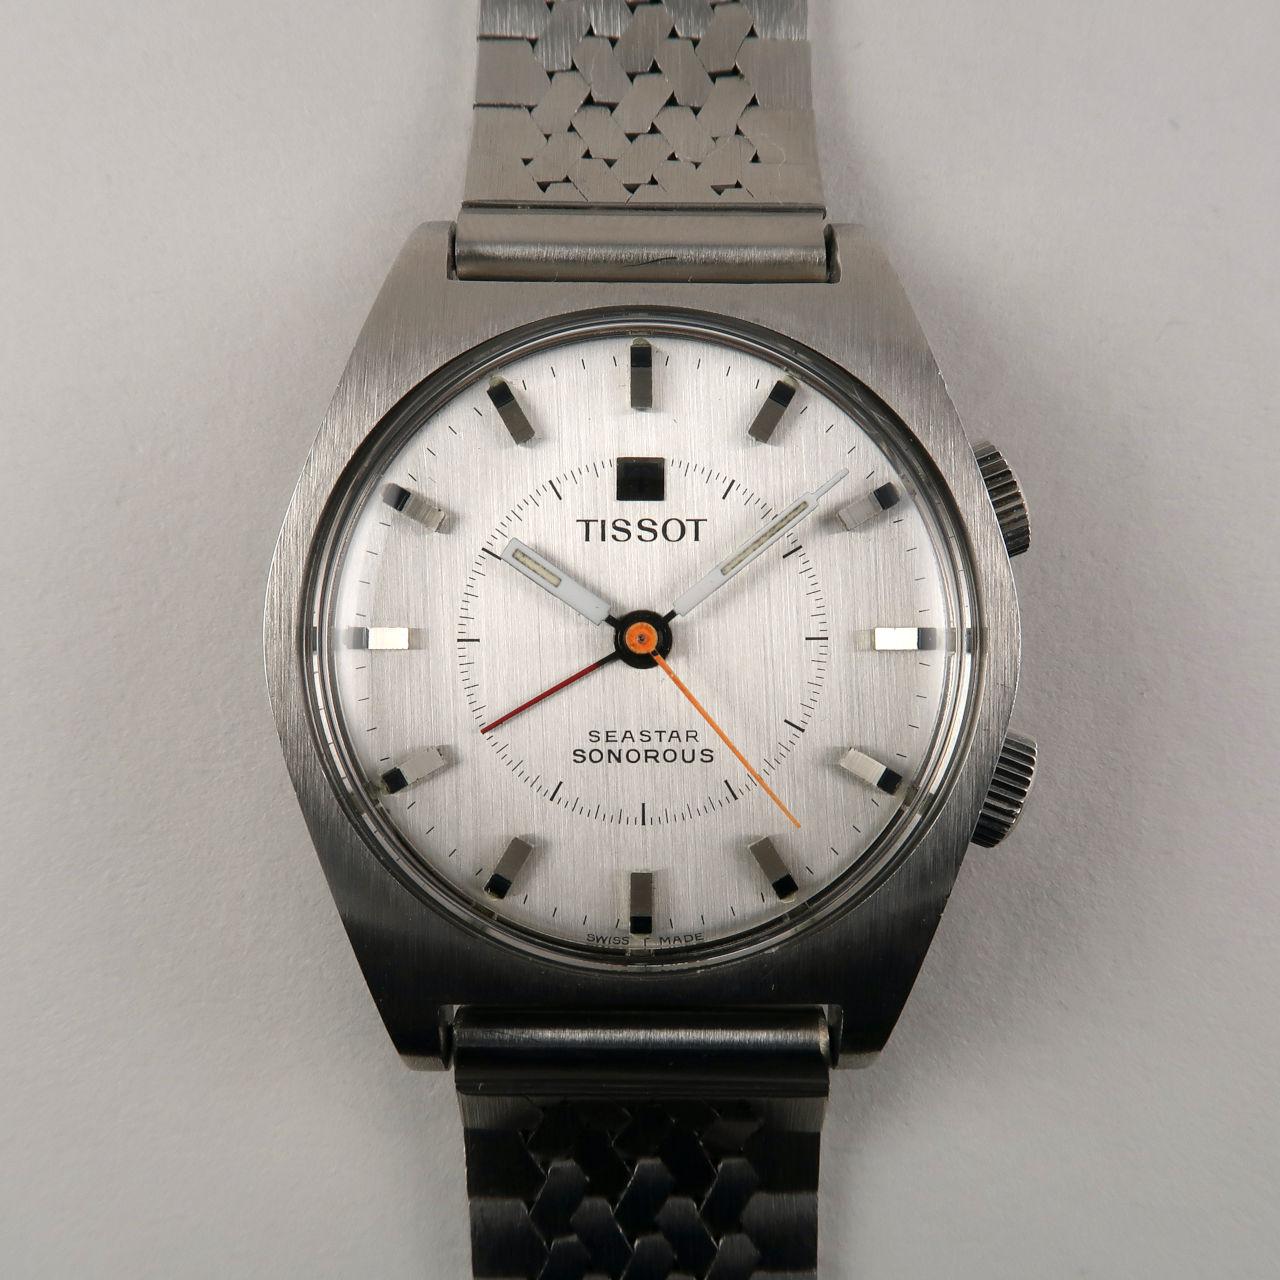 Tissot Seastar Sonorous Ref. 40500-3X circa 1970